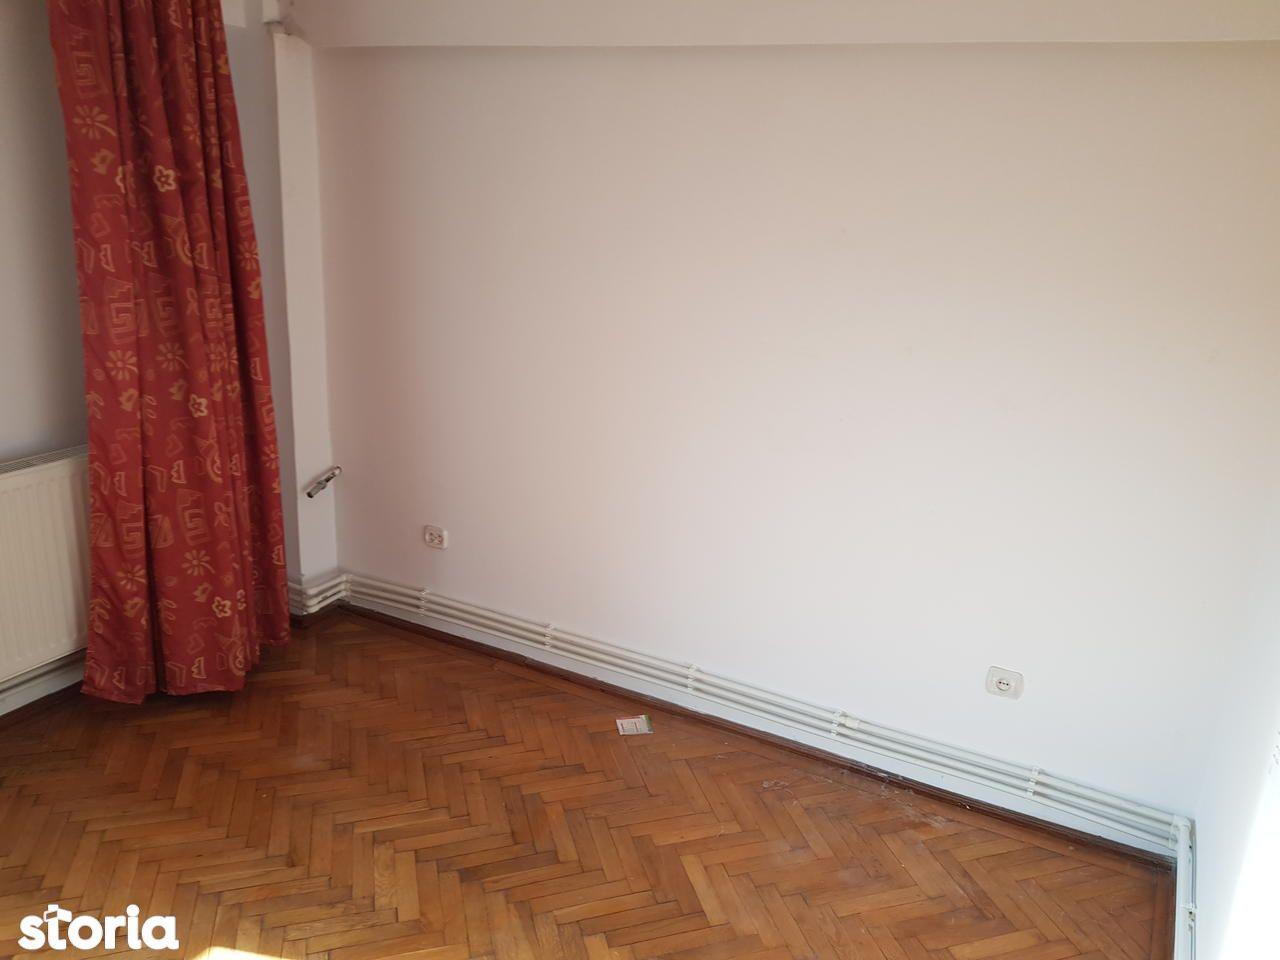 Apartament de vanzare, Constanța (judet), Bulevardul Aurel Vlaicu - Foto 5